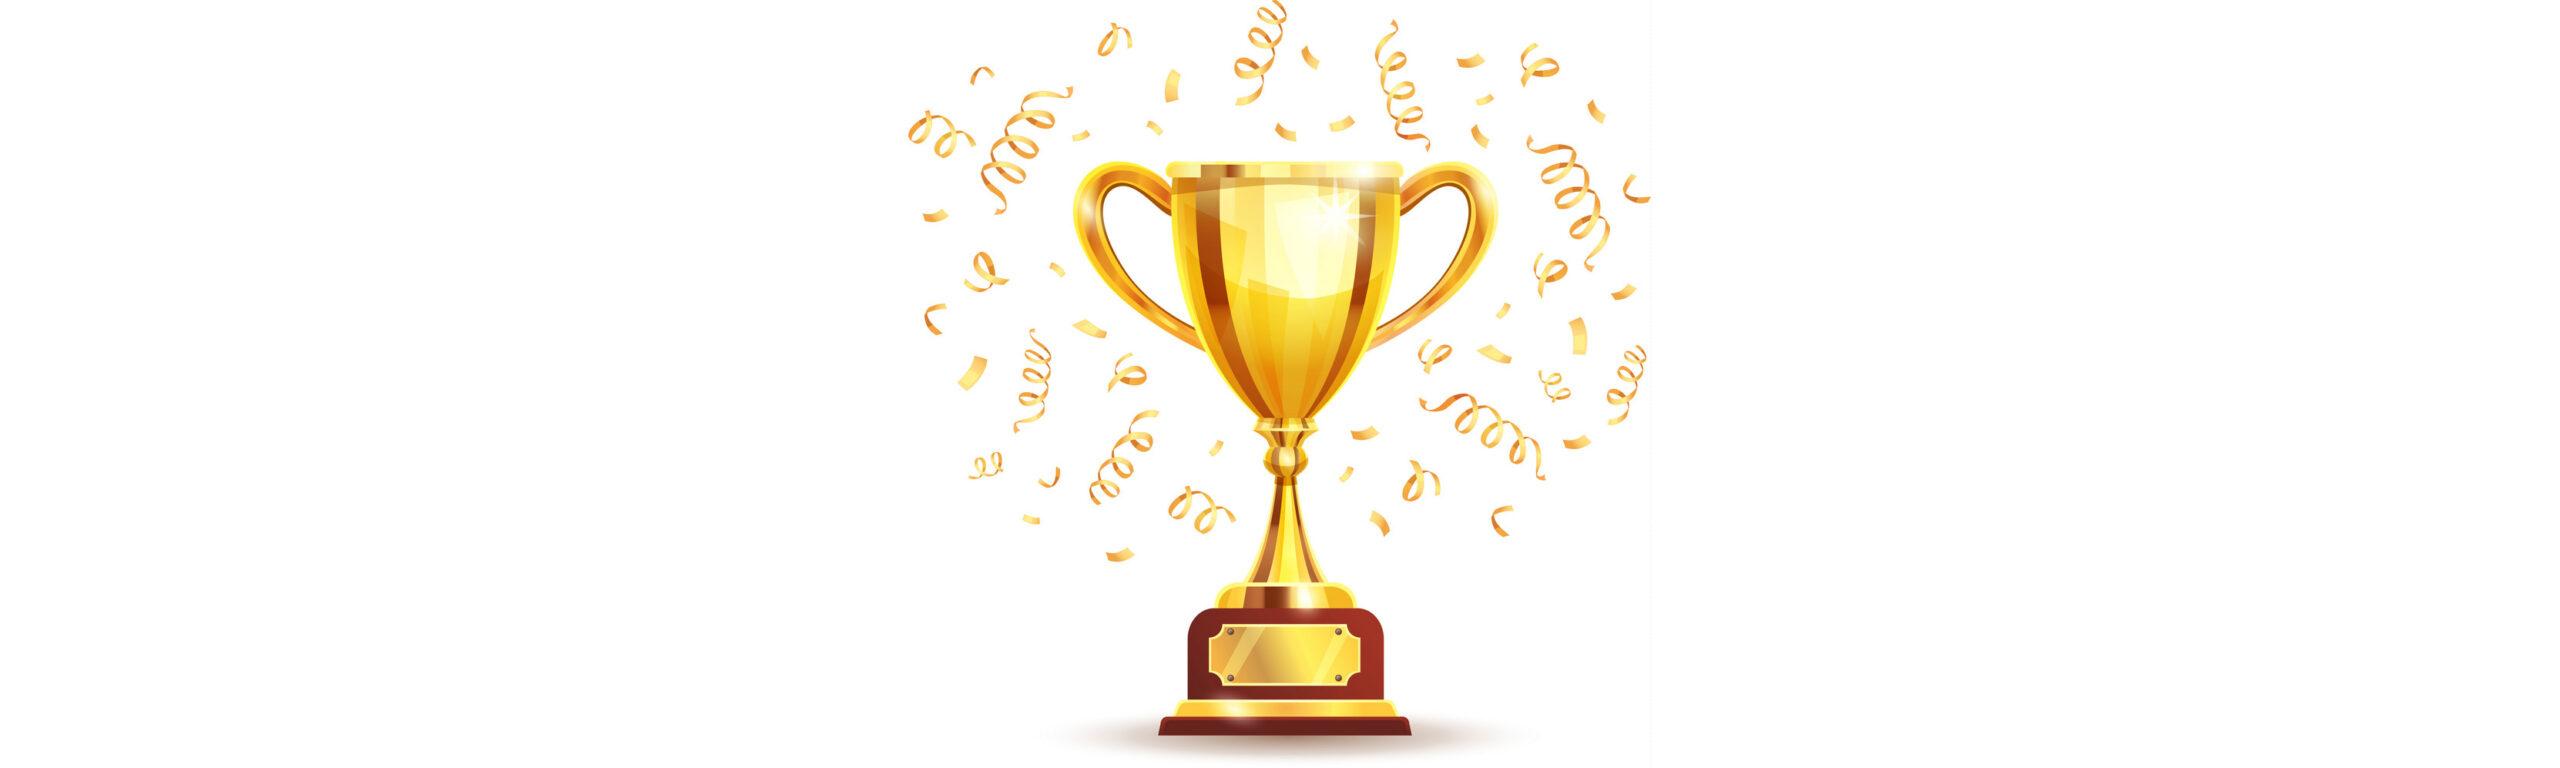 جوایز لیگ نویسندگی مرکز نوآوری